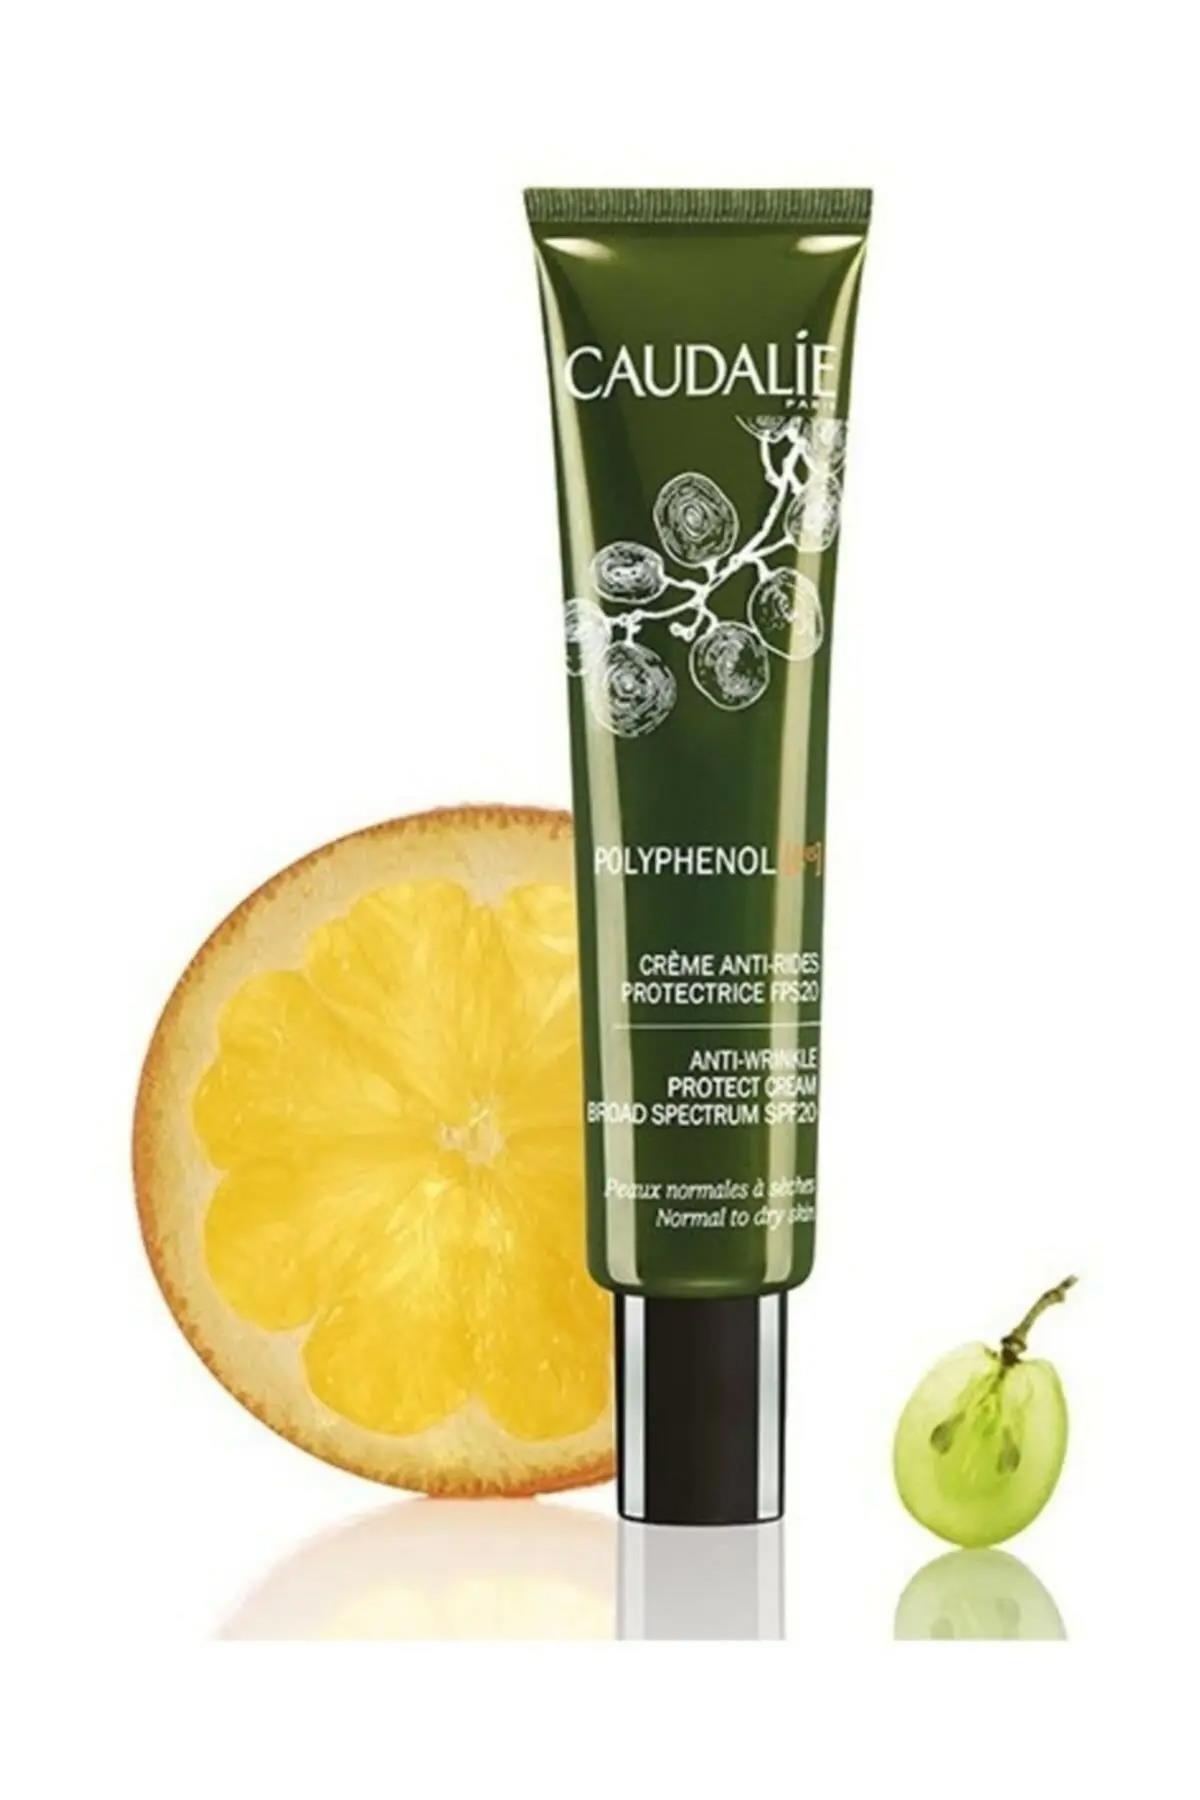 Caudalie Polyphenol C15 Anti Wrinkle Protect Fluid Spf20 40 ml 1